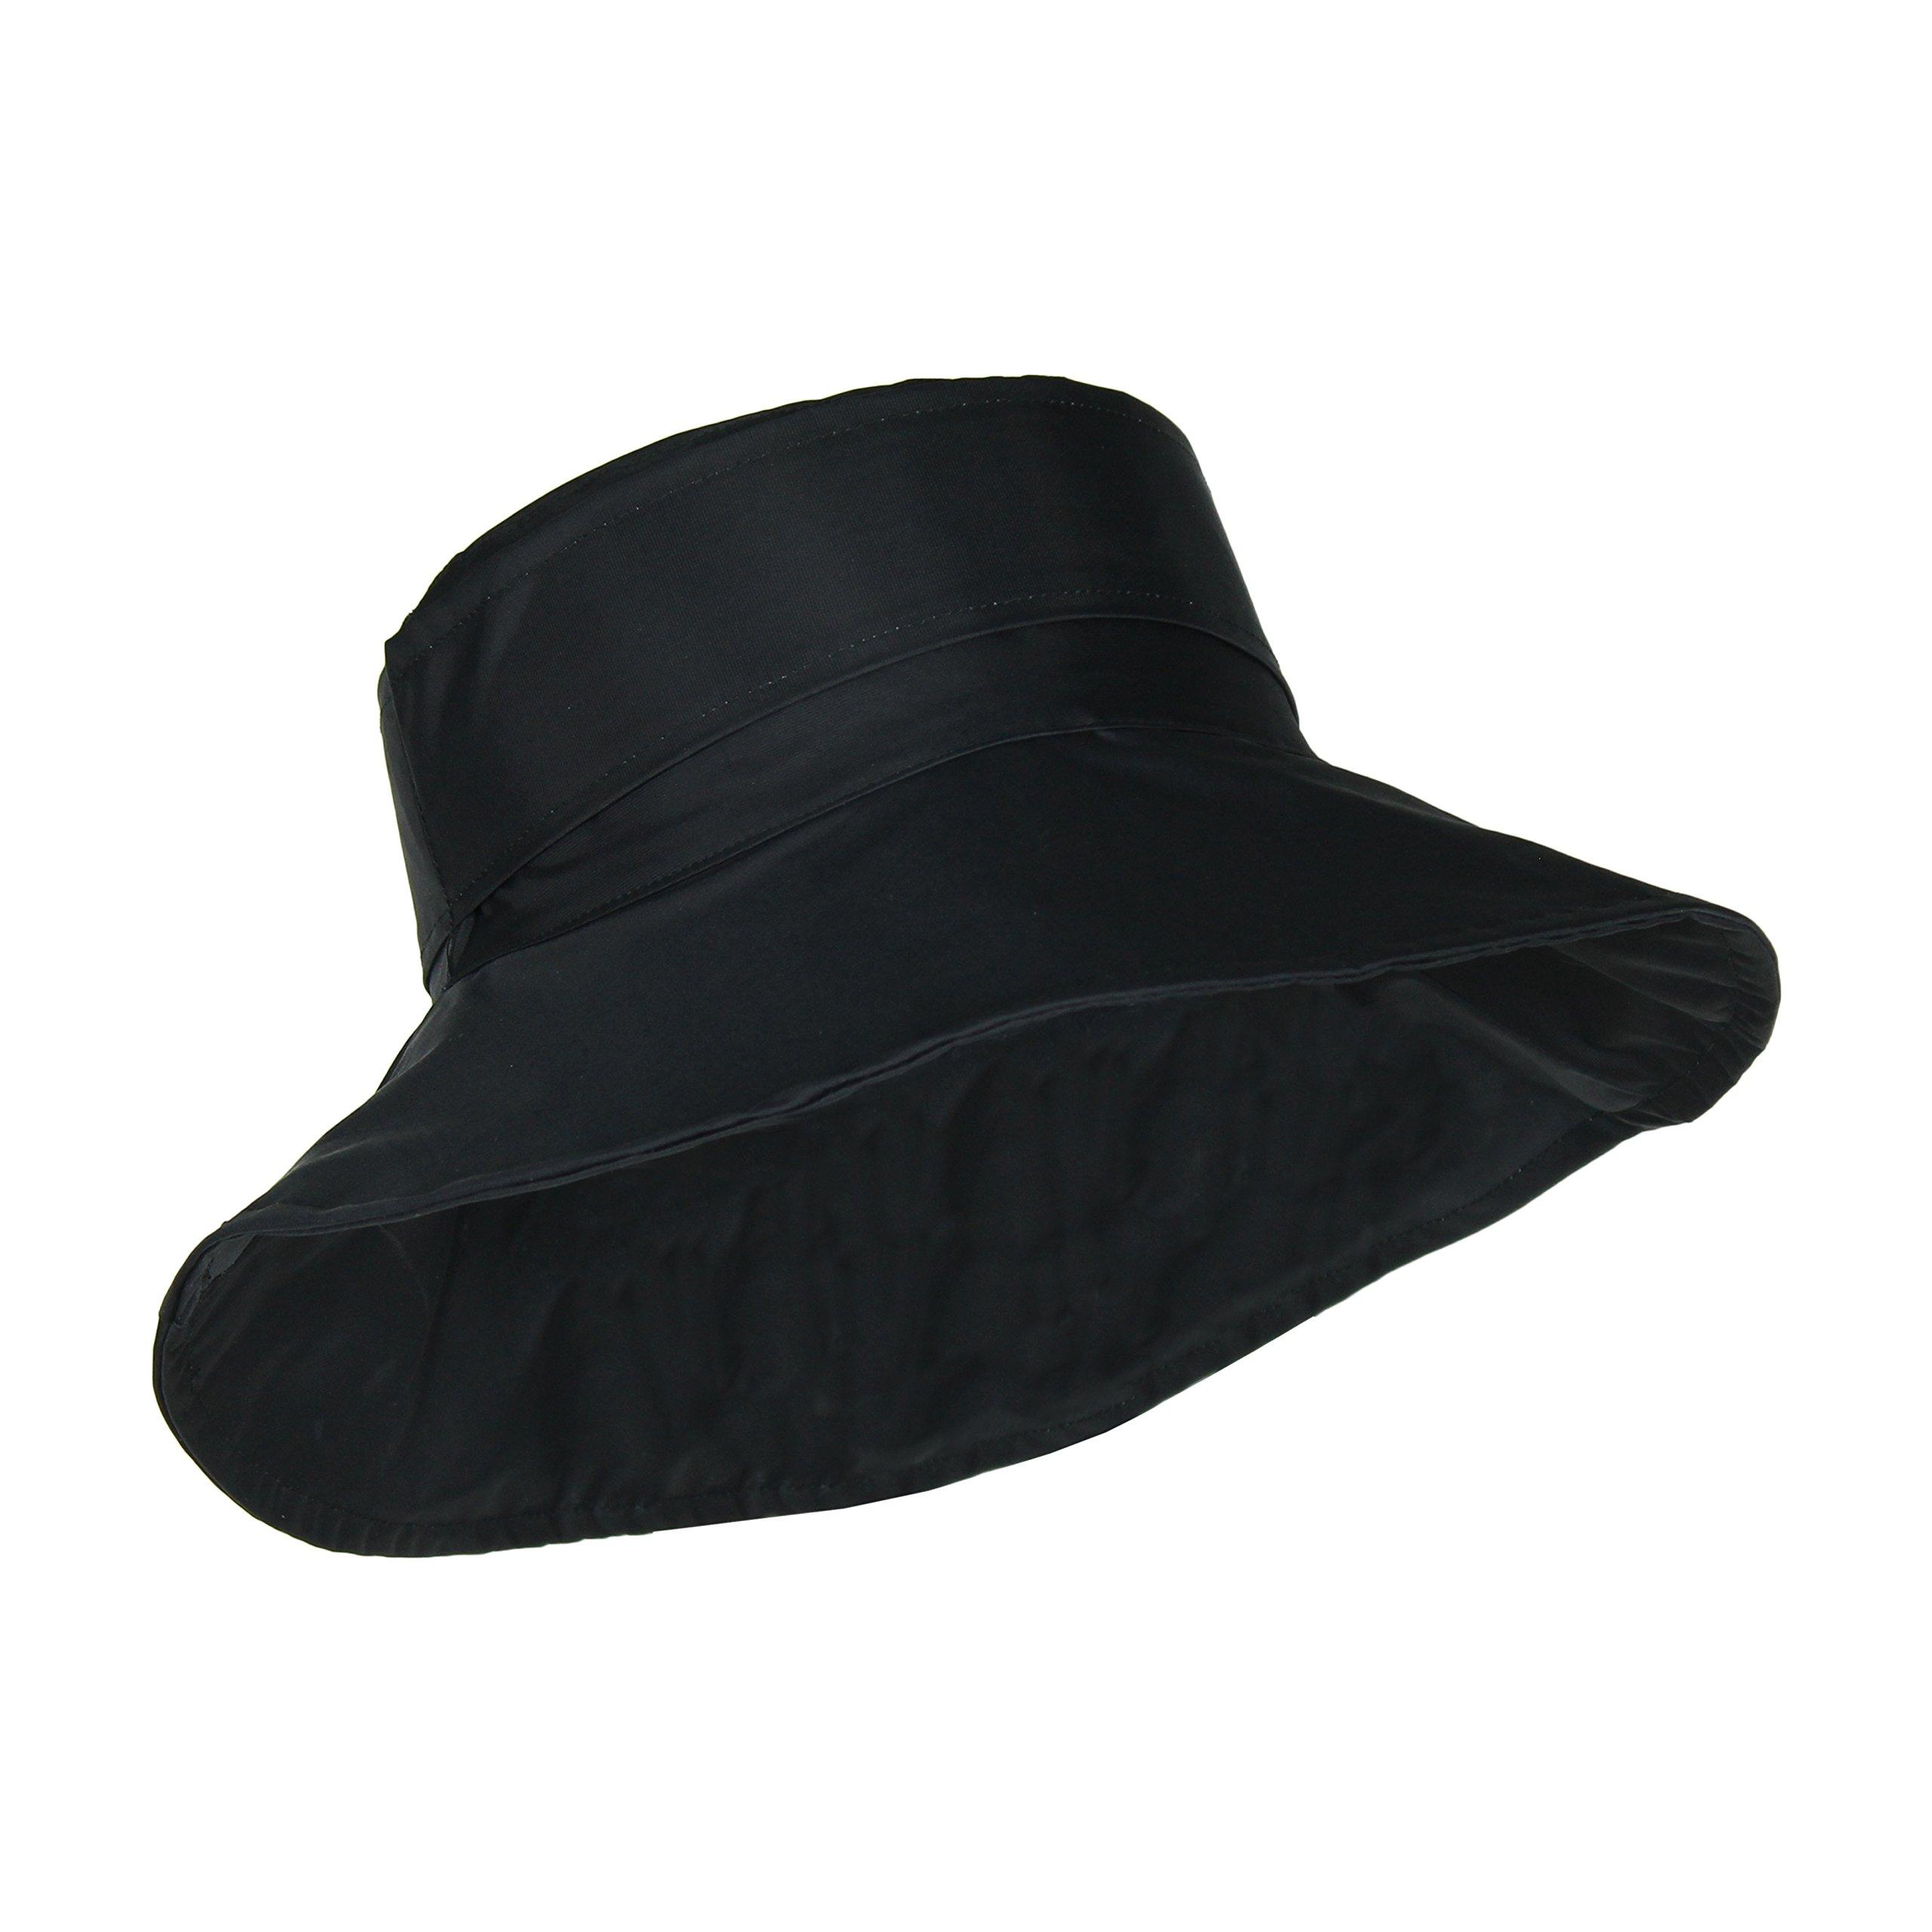 Black Packable Bucket Rain Hat w/ Buckle, 3.5 inch Wide Brim